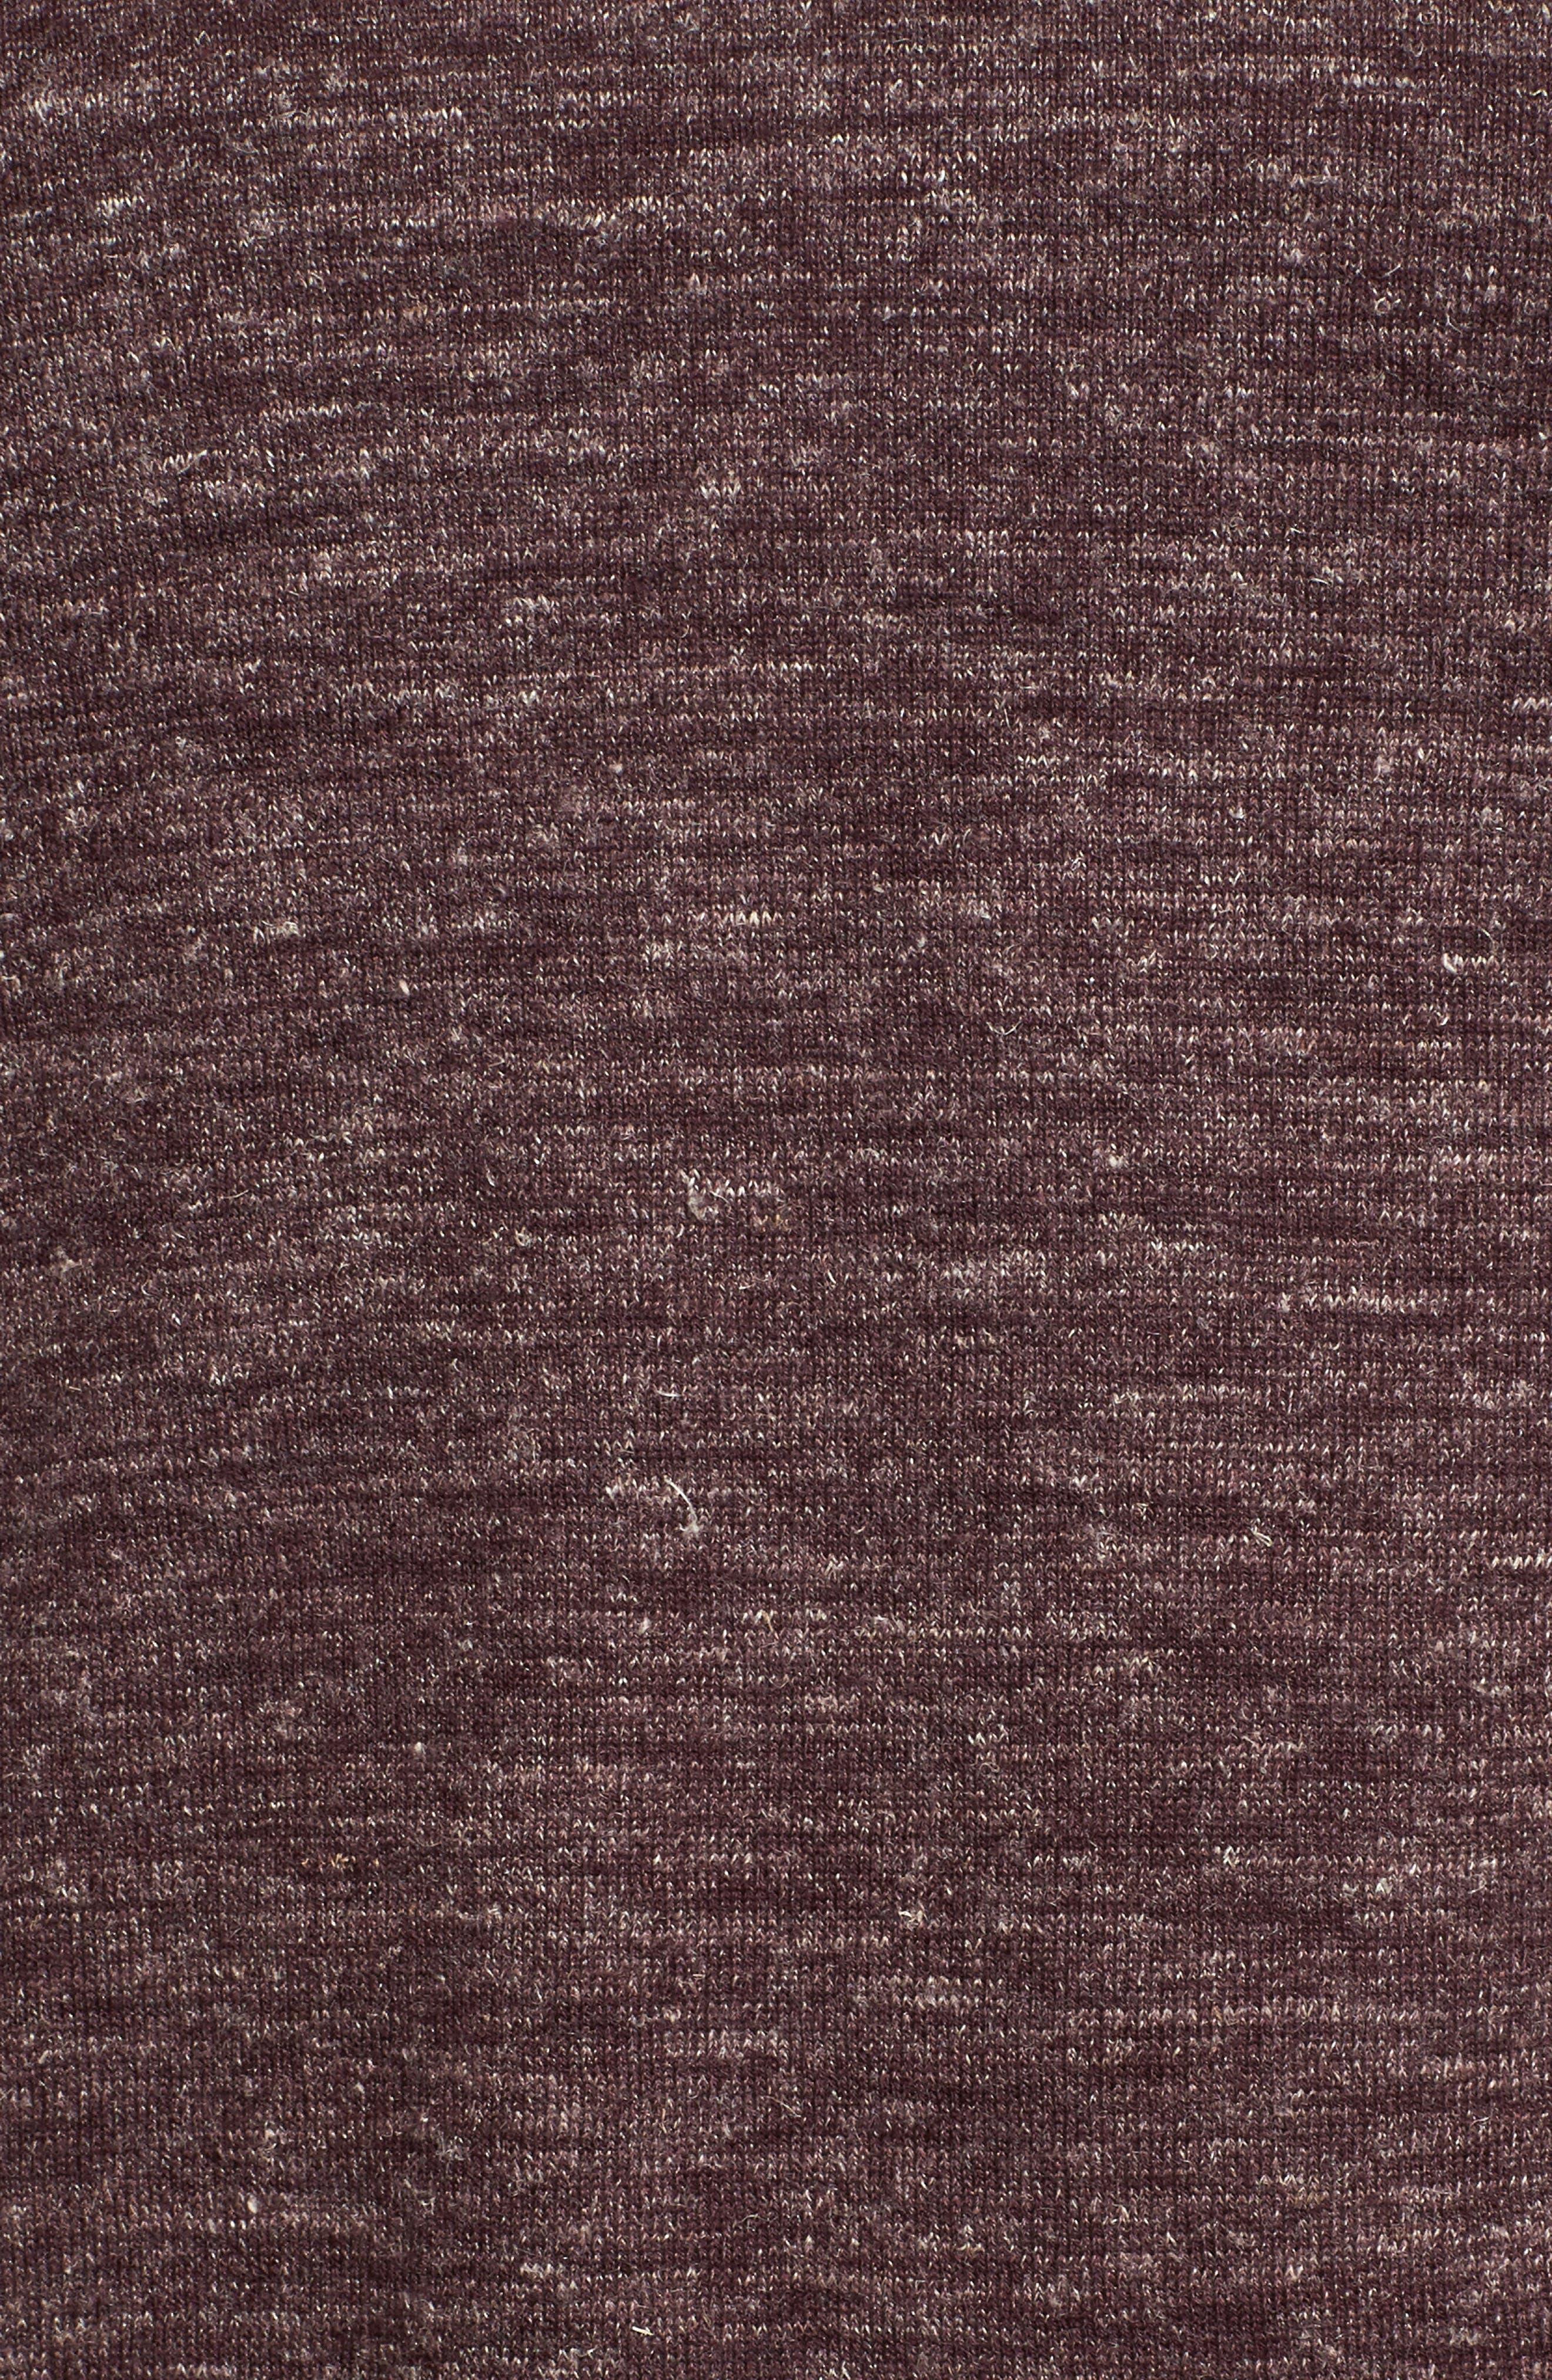 Heathered Crewneck Sweater,                             Alternate thumbnail 5, color,                             Oxblood